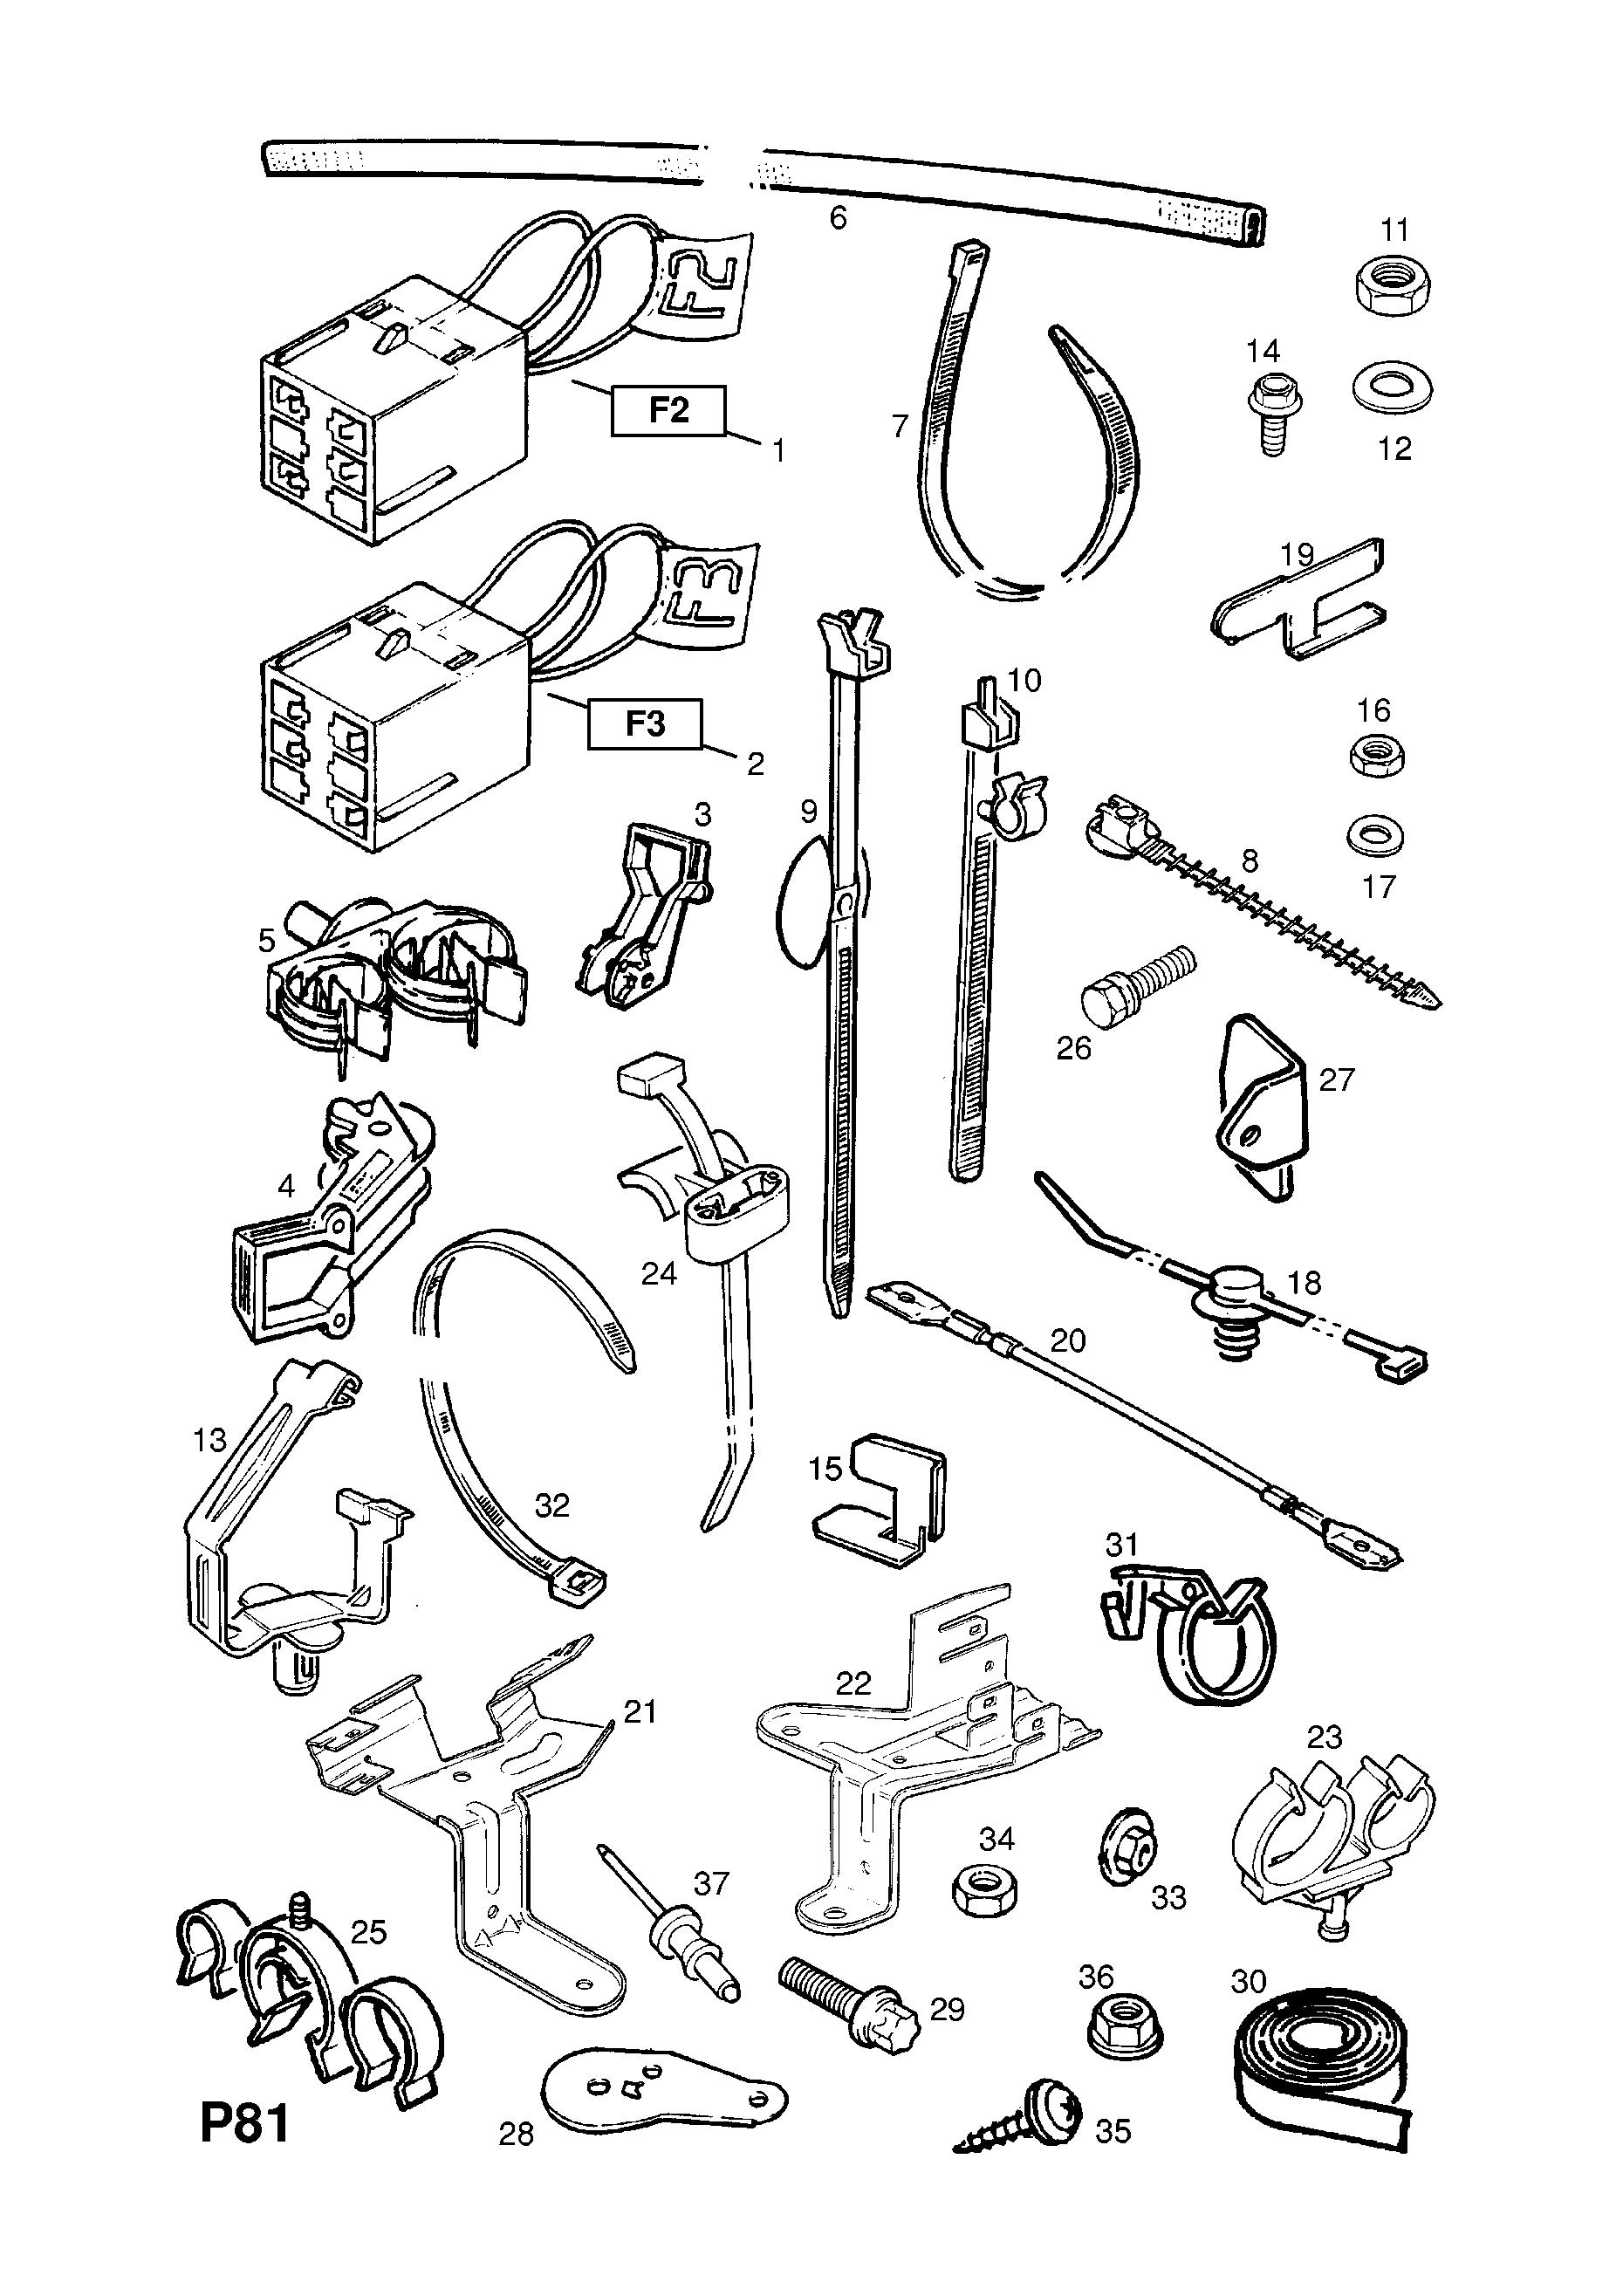 corsa b wiring harness wiring diagrams rh 11 13 3 masonuk de